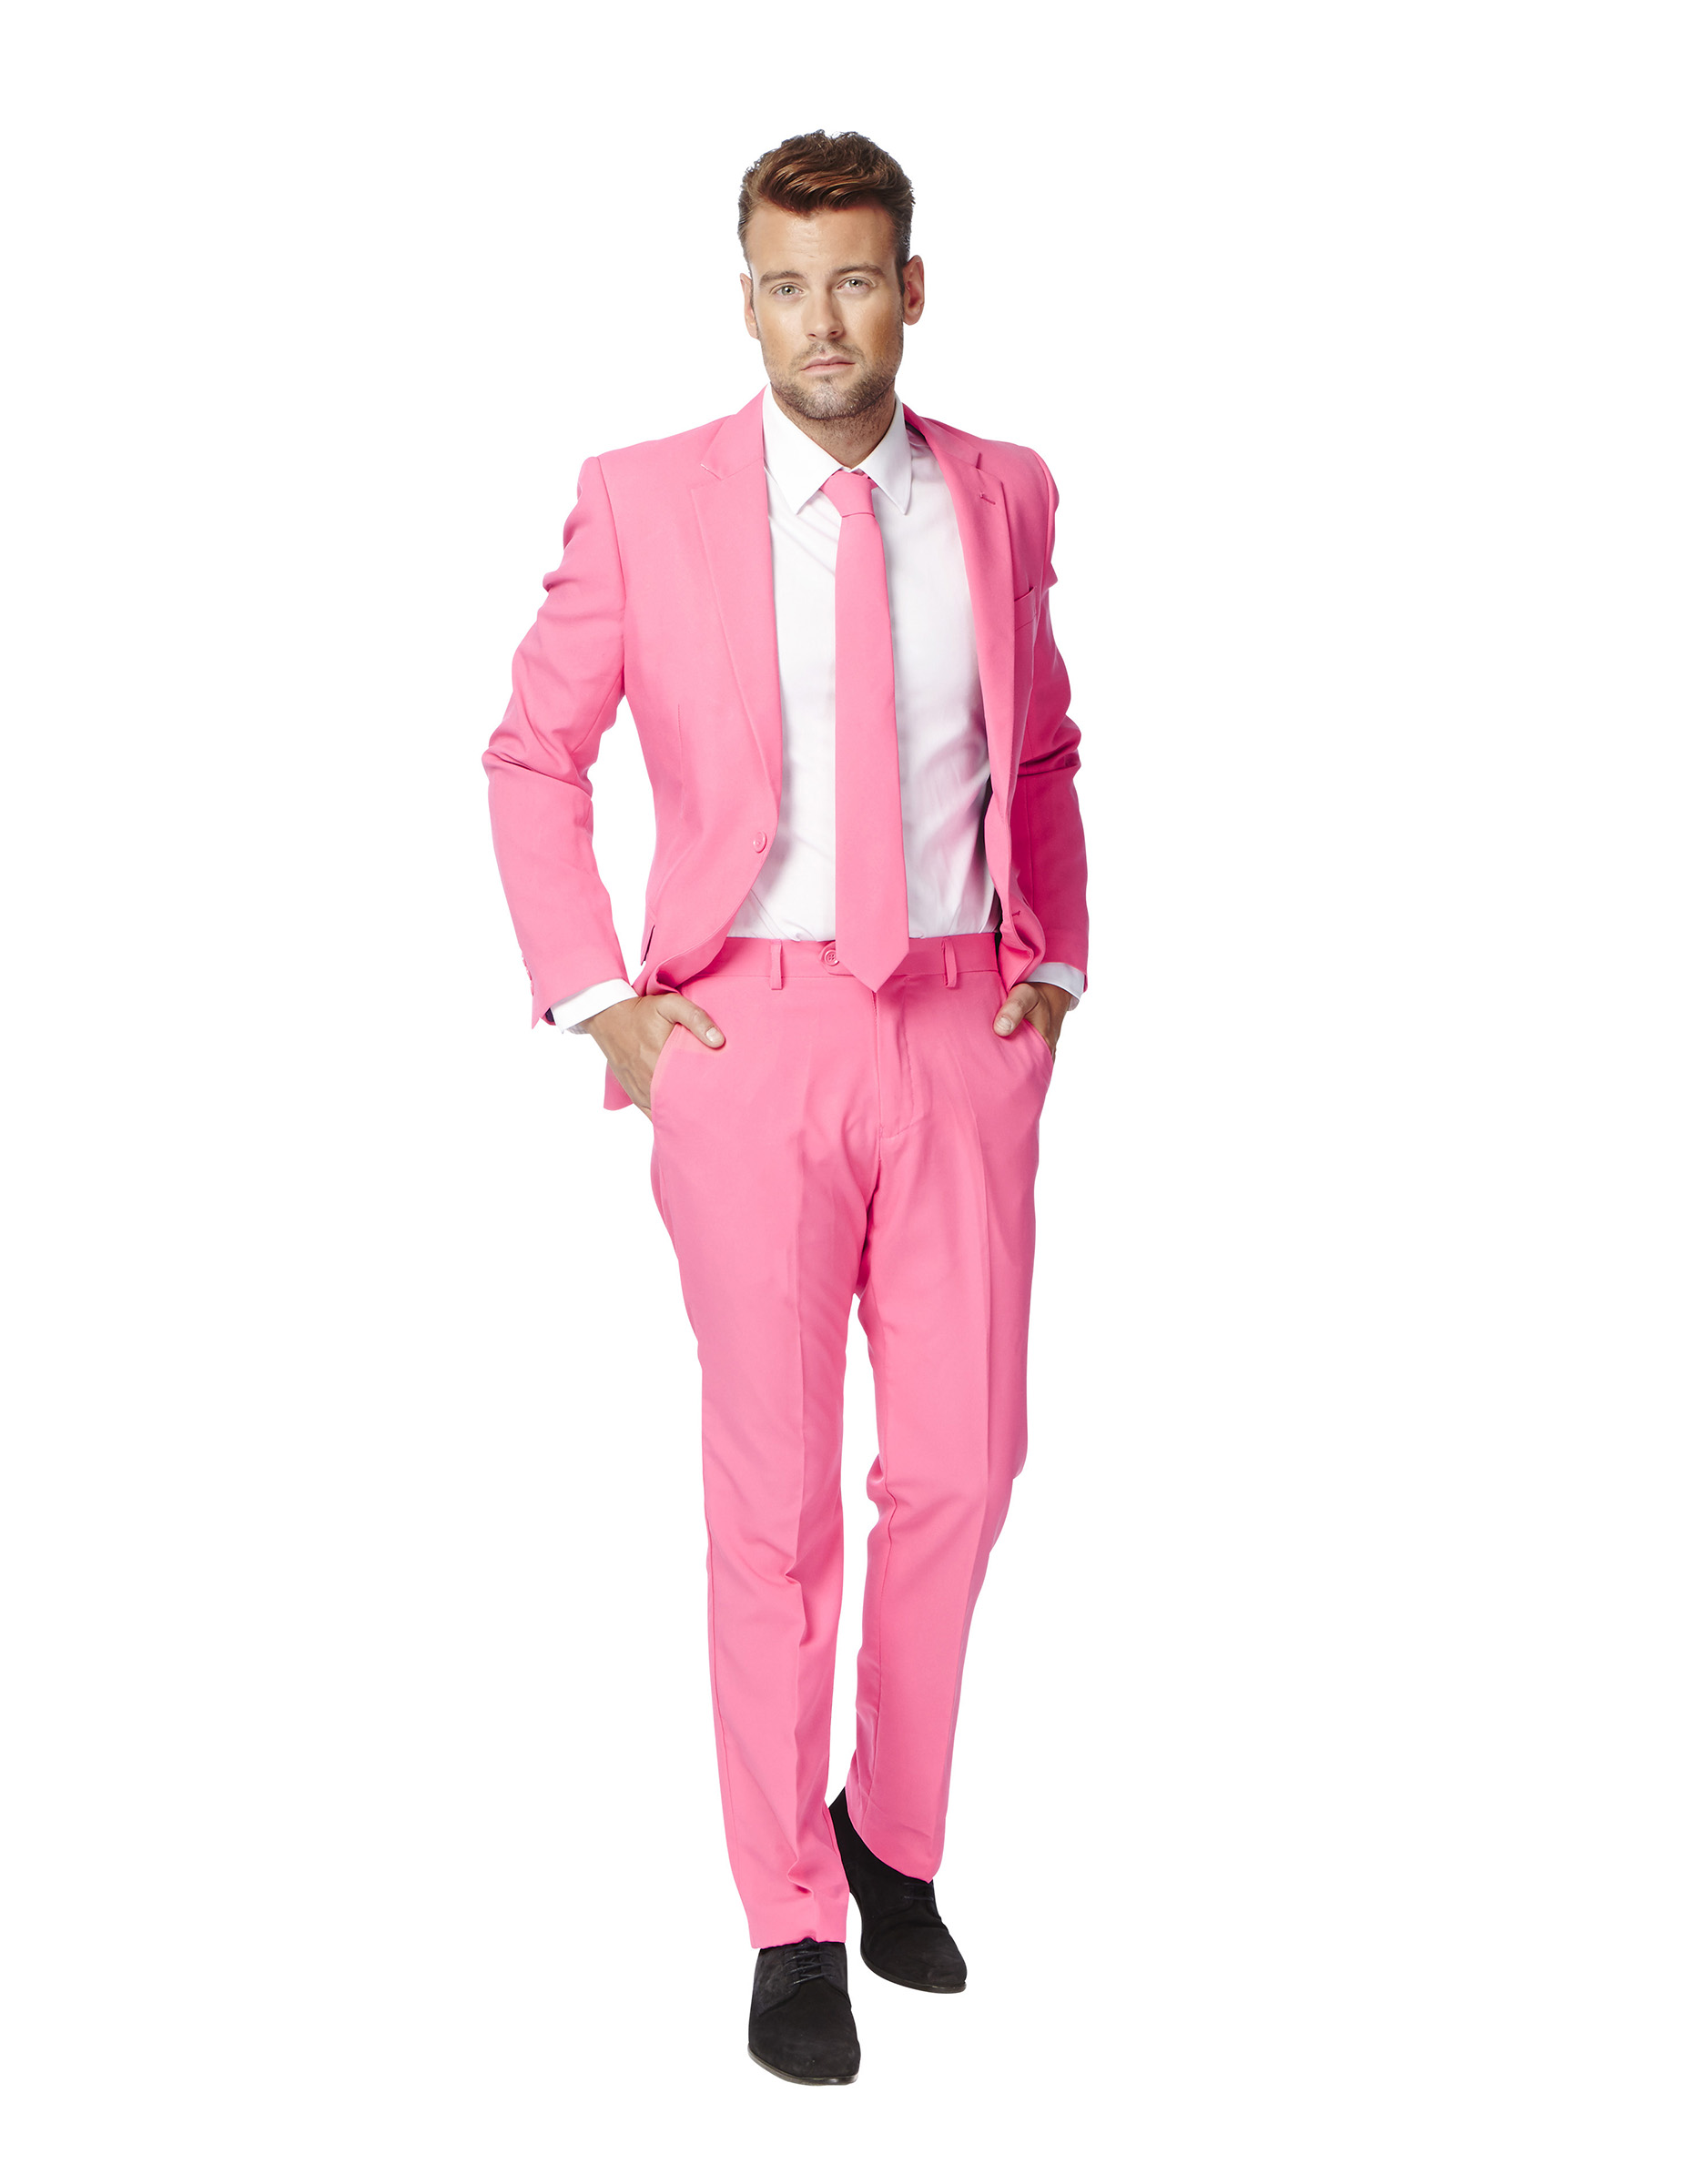 Costume rose homme mariage - fermeleycaut.fr db111926e19